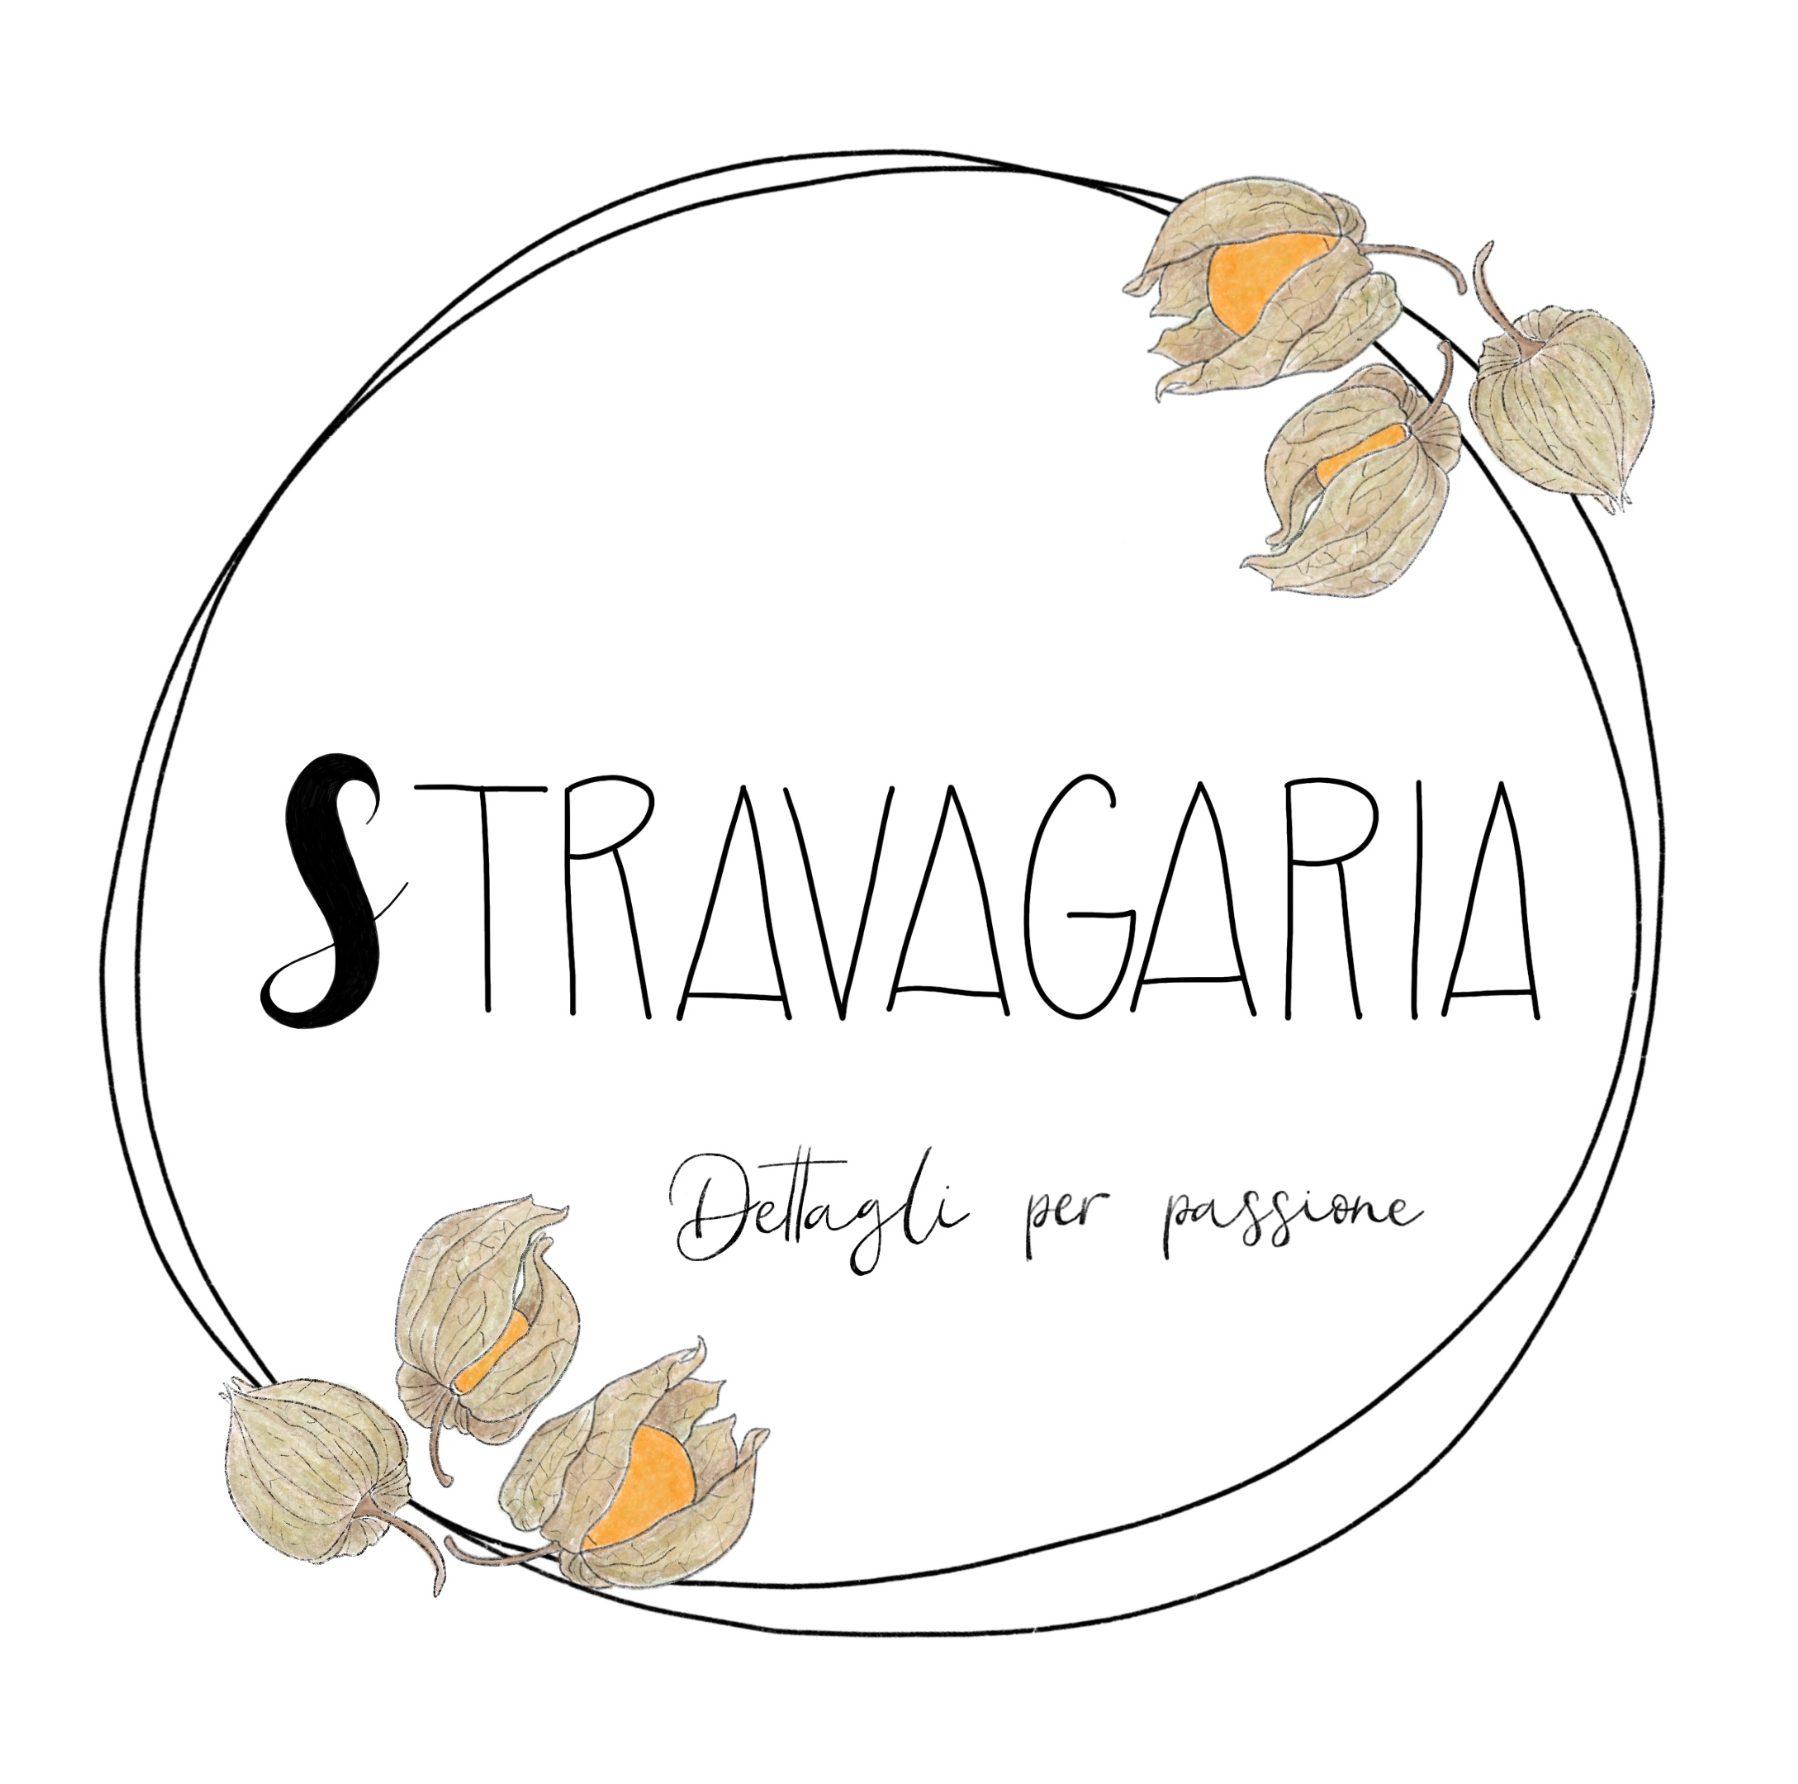 STRAVAGARIA